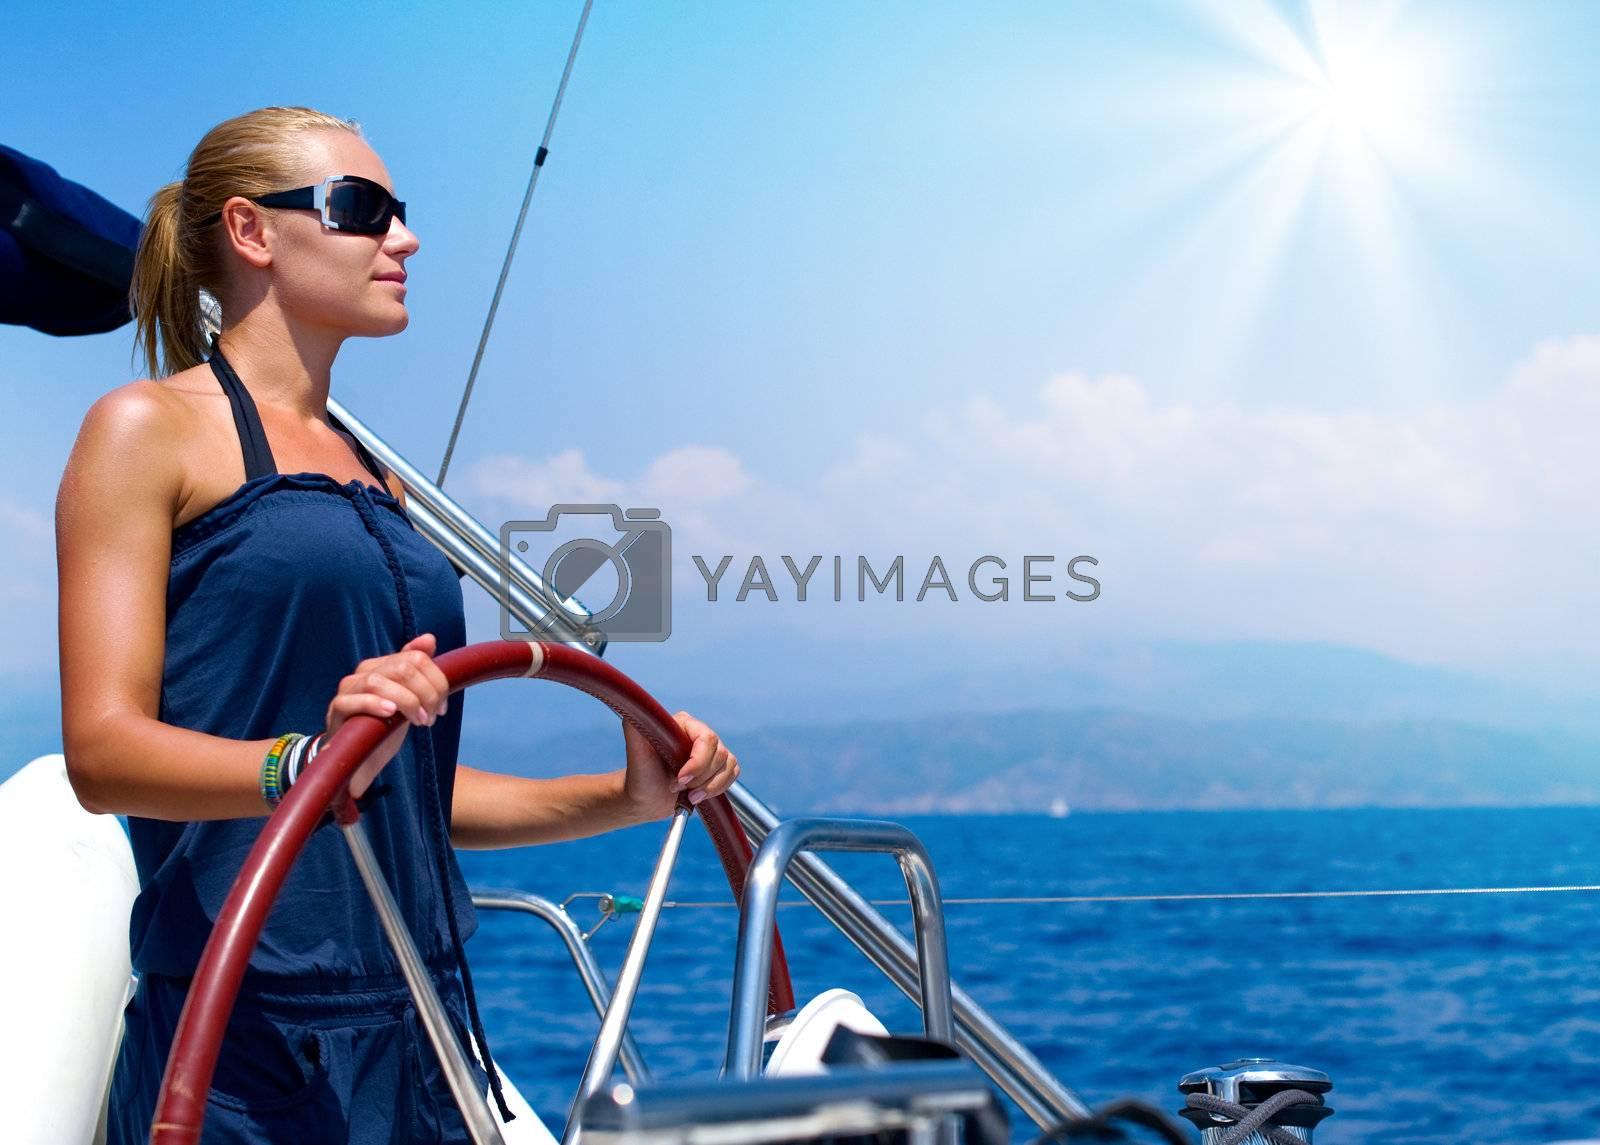 Yacht Sailing by SubbotinaA